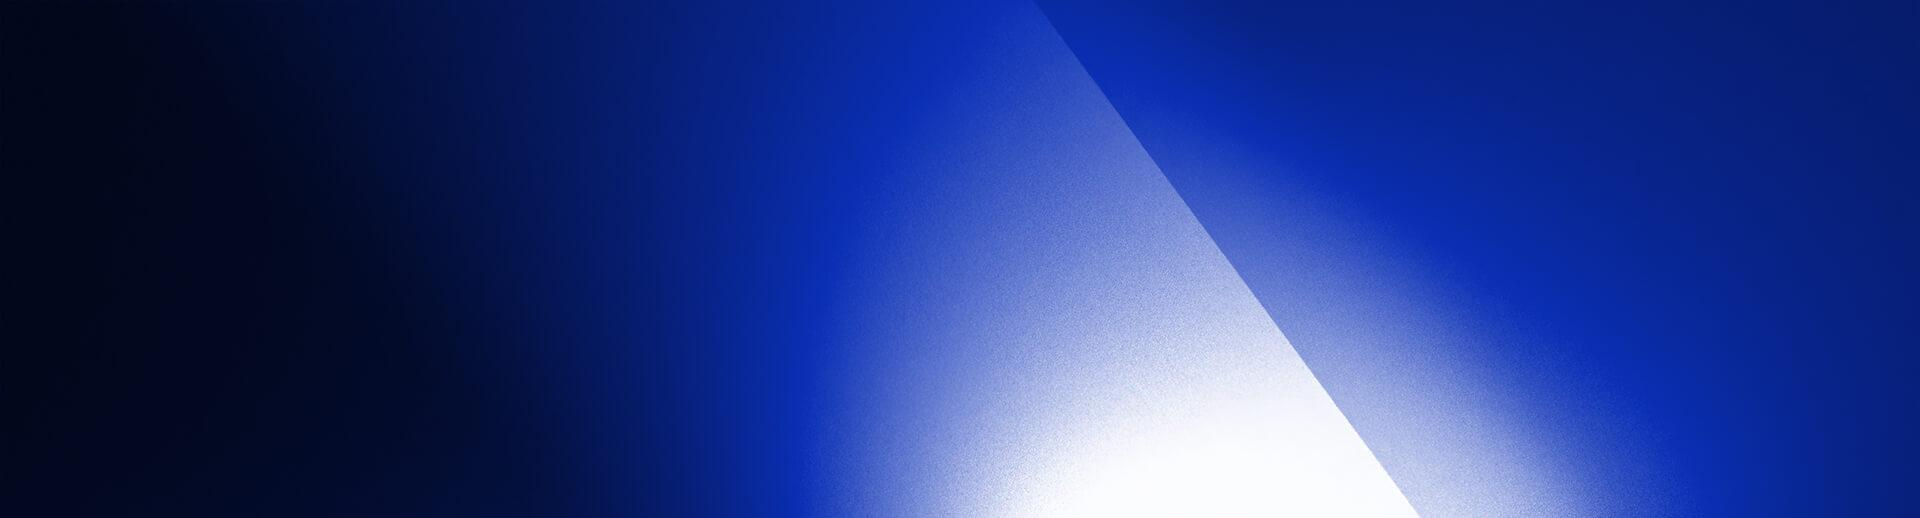 rra-background-blue-8-2021.jpg